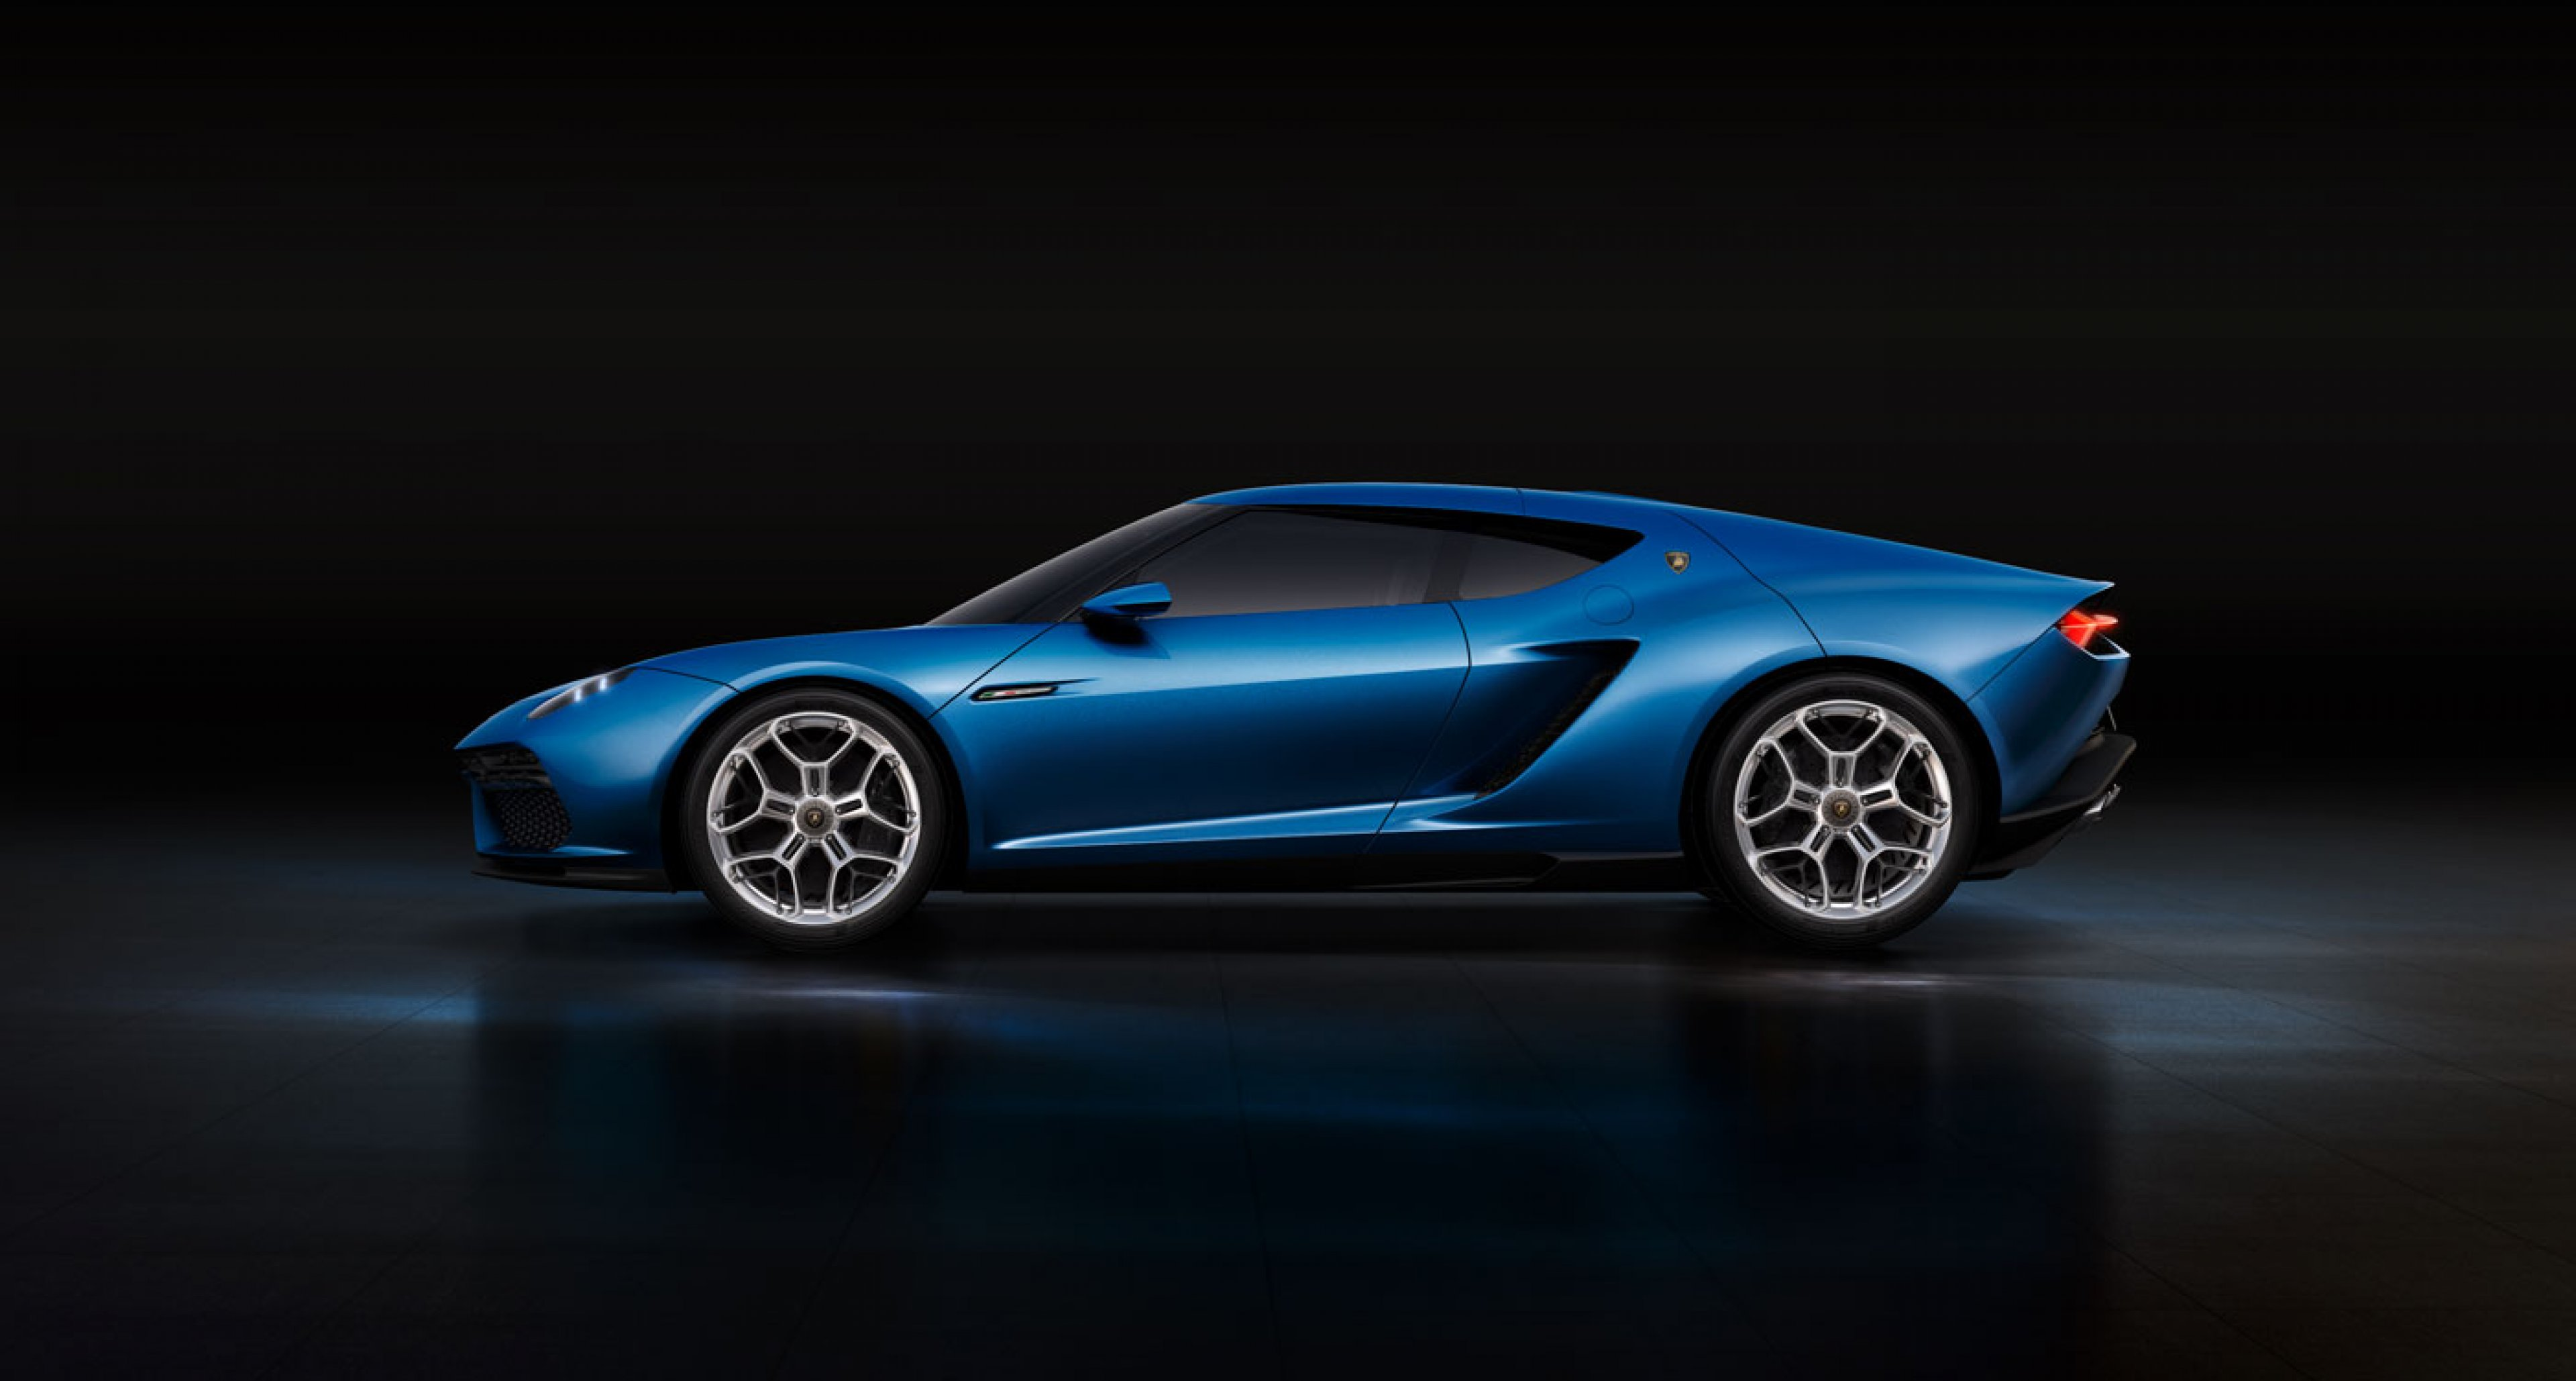 Lamborghini Asterion LPI 910-4